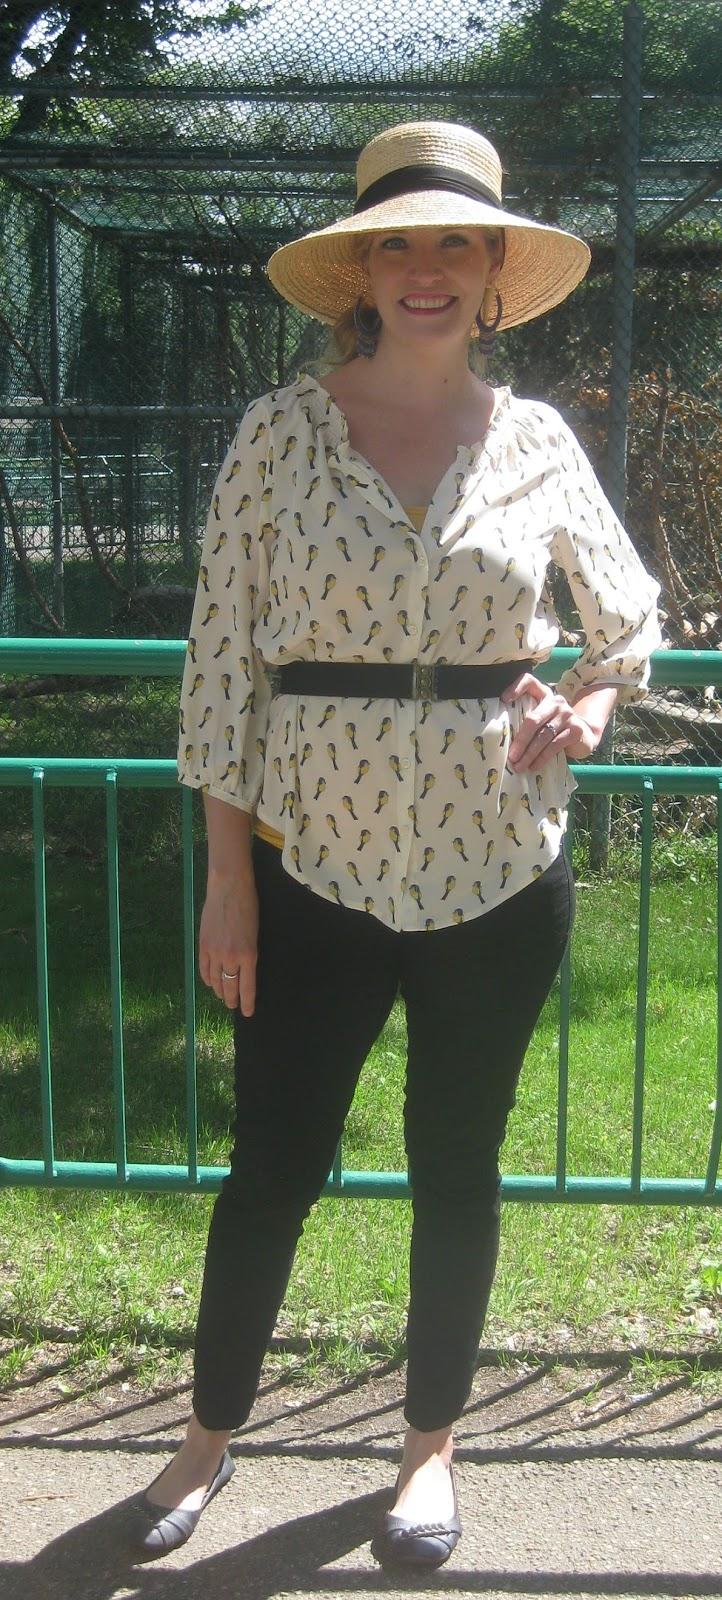 http://vvboutiquestyle.blogspot.ca/2013/08/flattered-by-flatter-me-belts.html